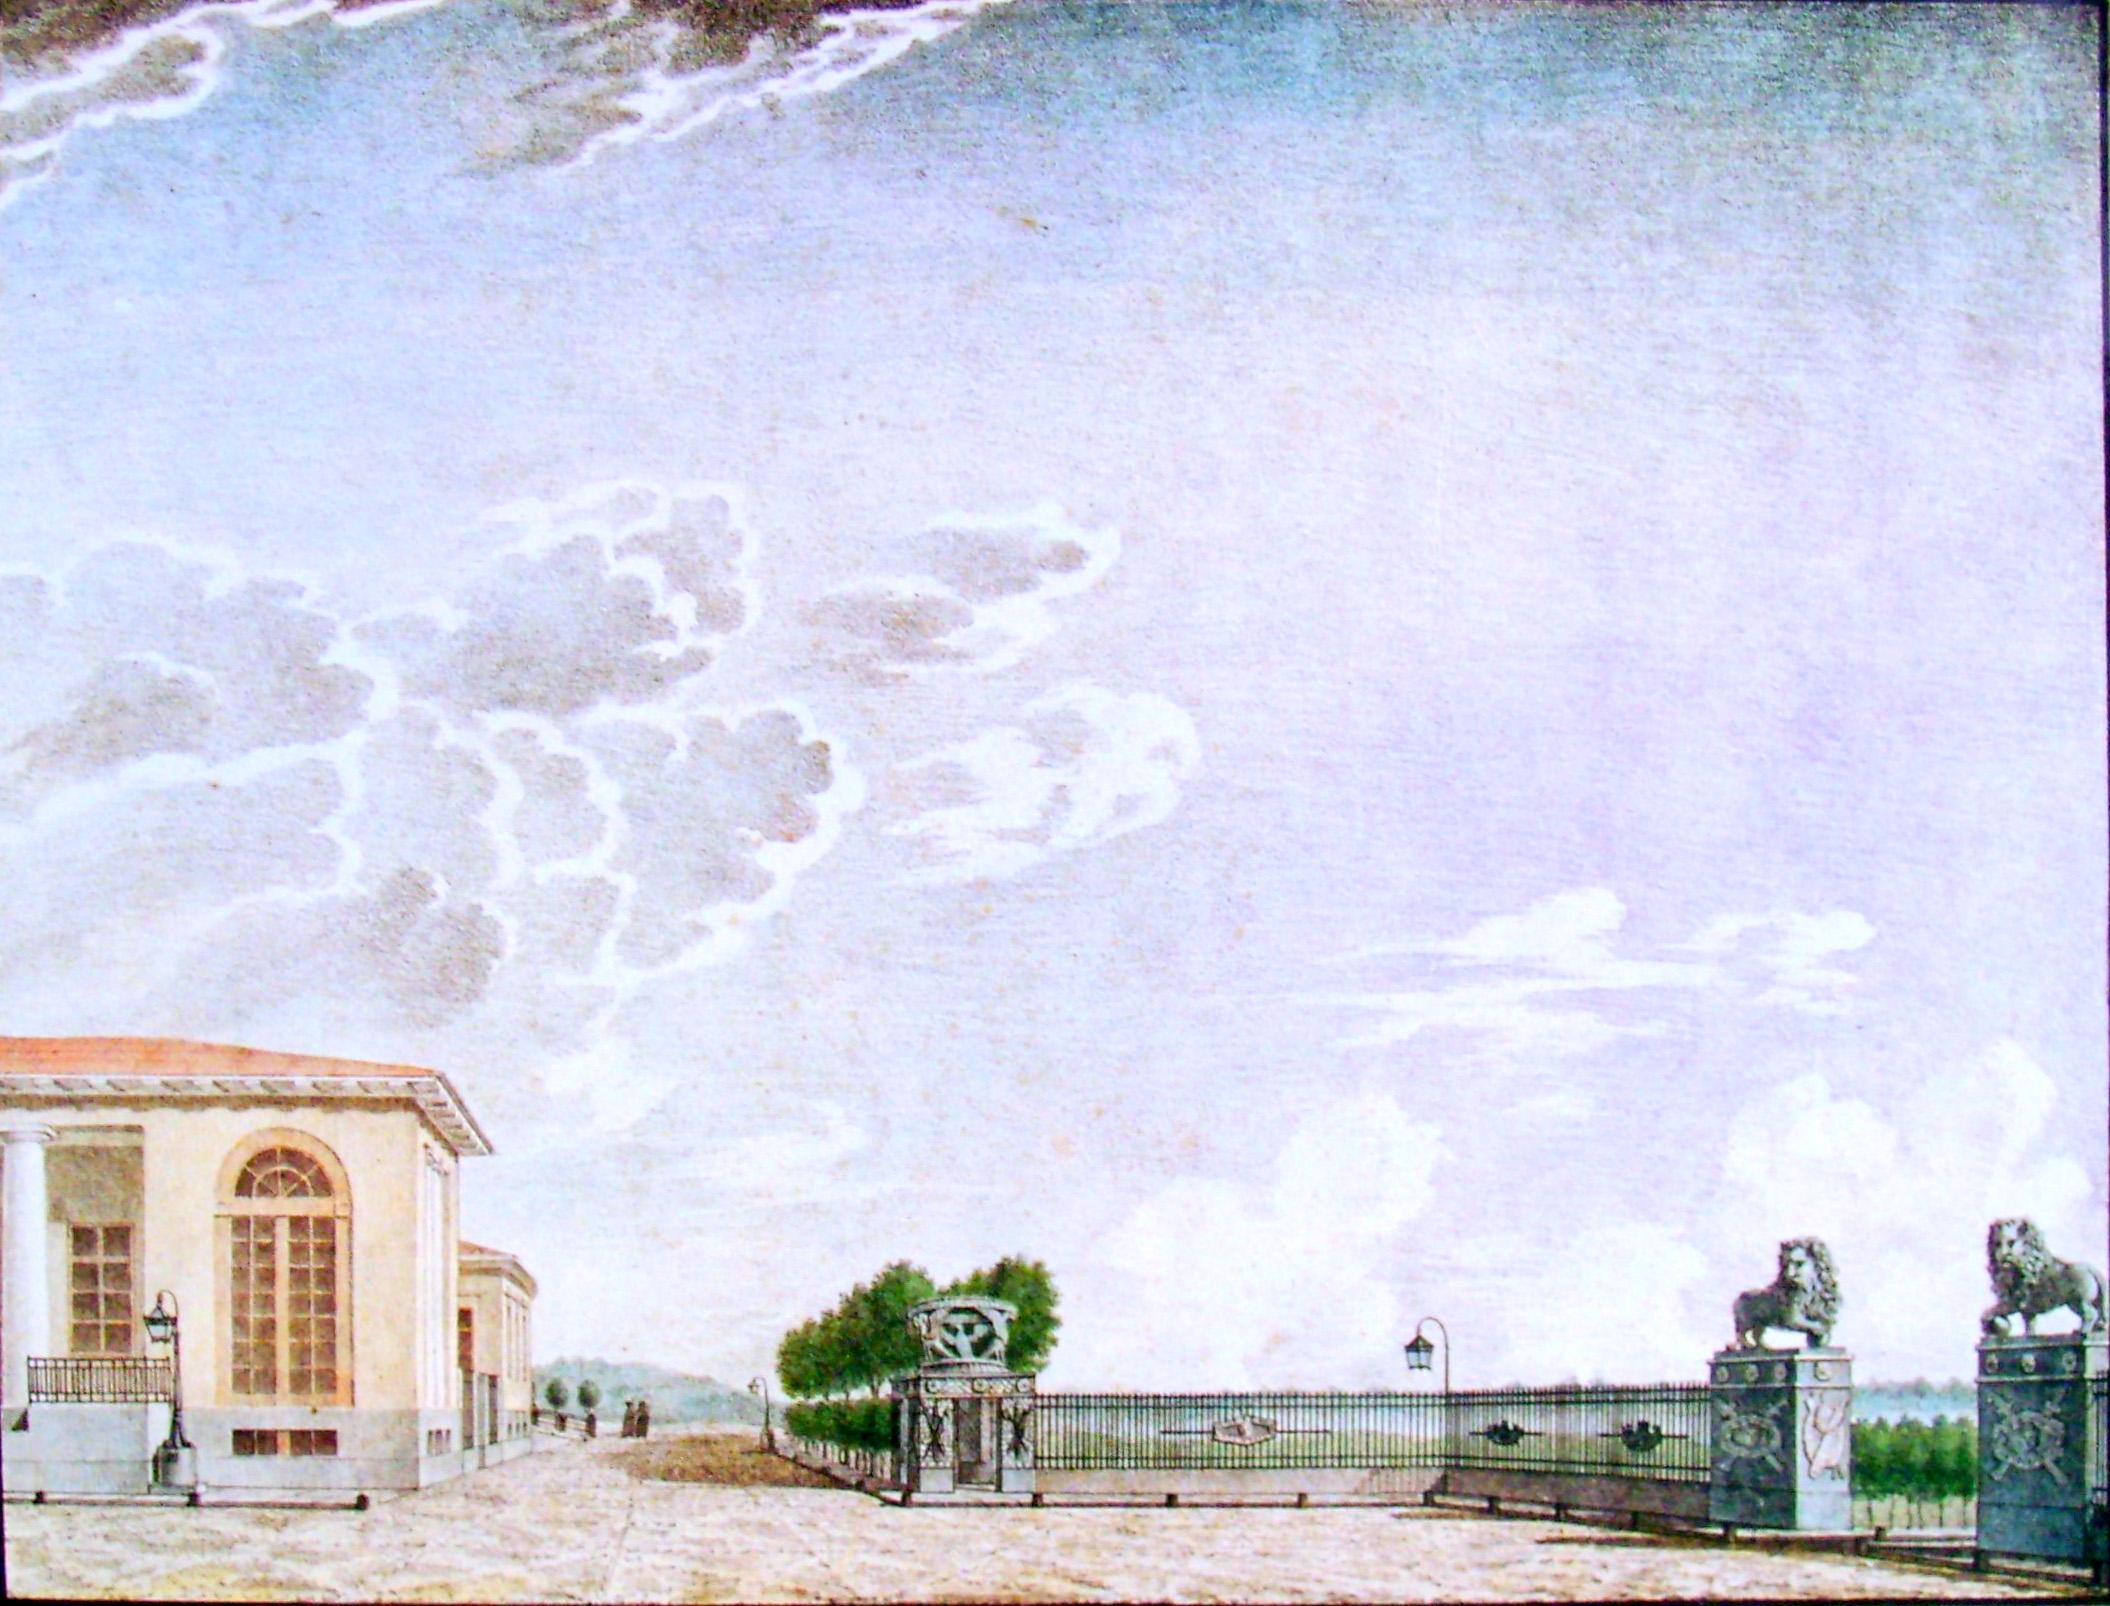 33. Вид чугунной решетки на площади с приезда от реки Волхова в село Грузино. Рисовал И. Семенов